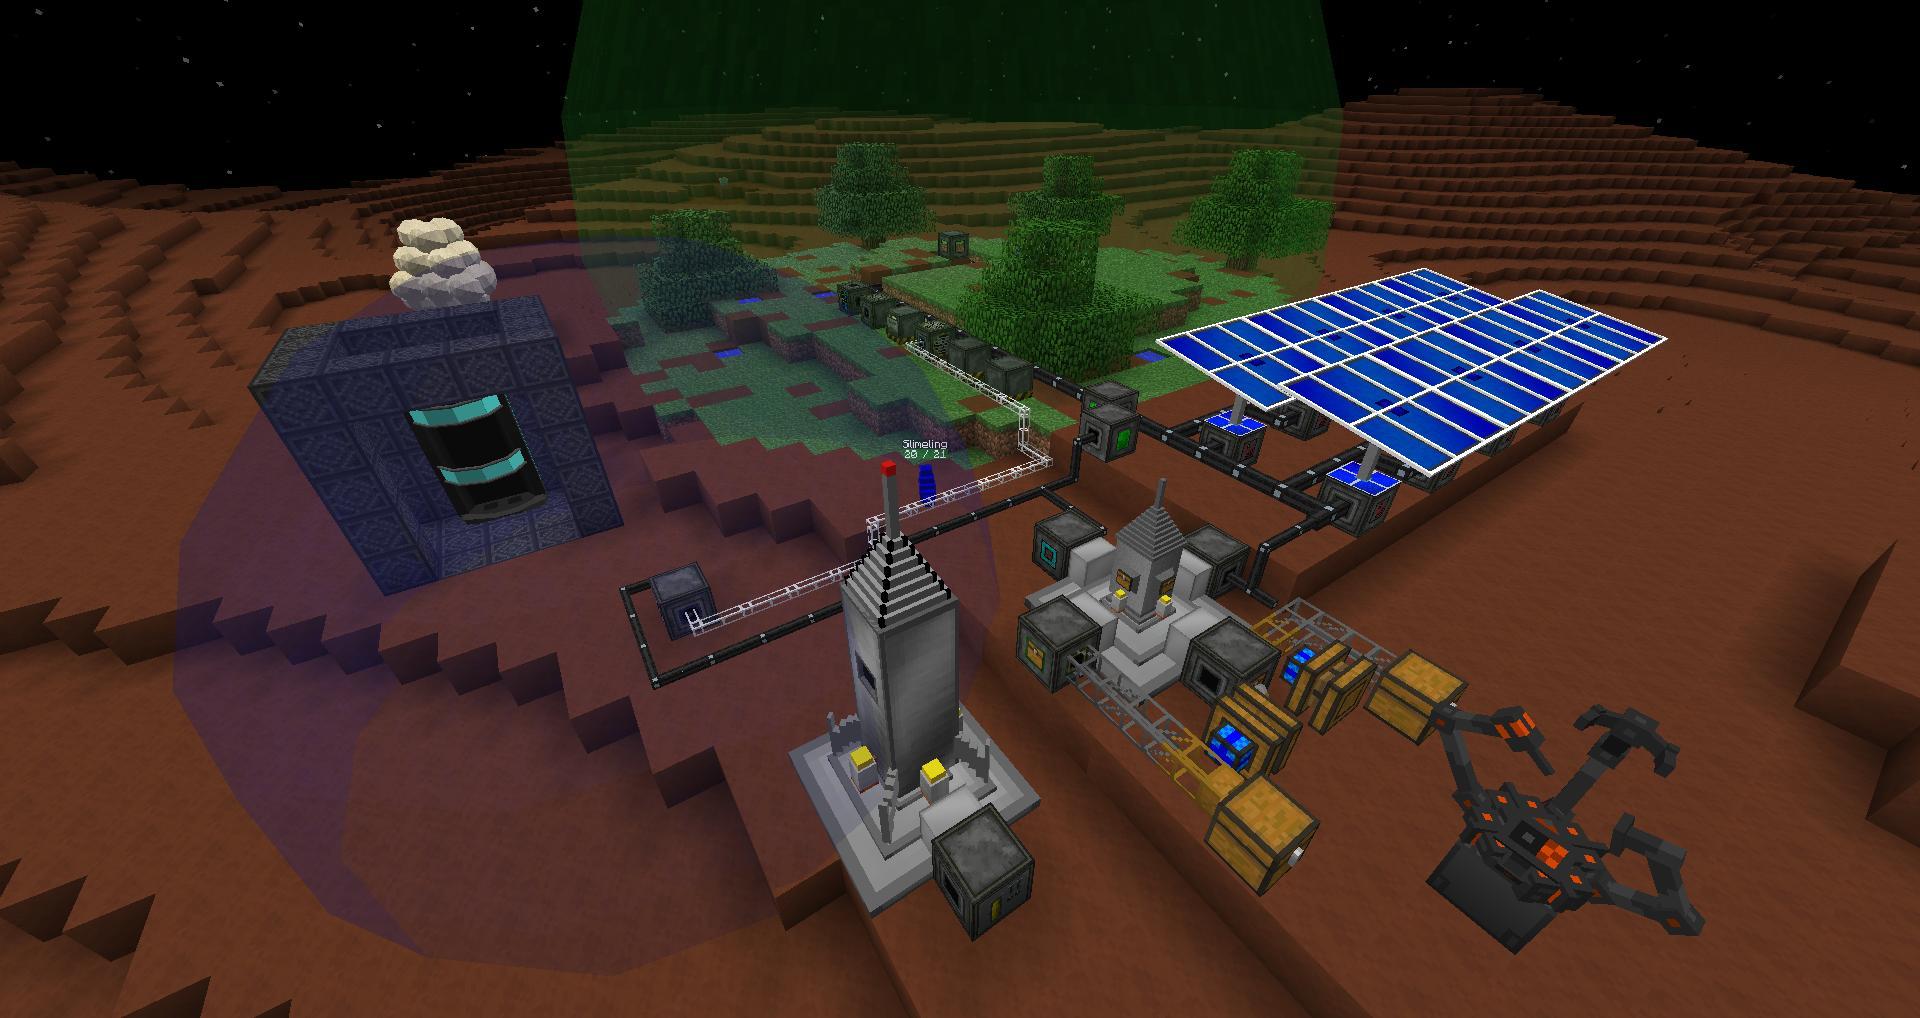 Minecraft Galacticraft Mod image